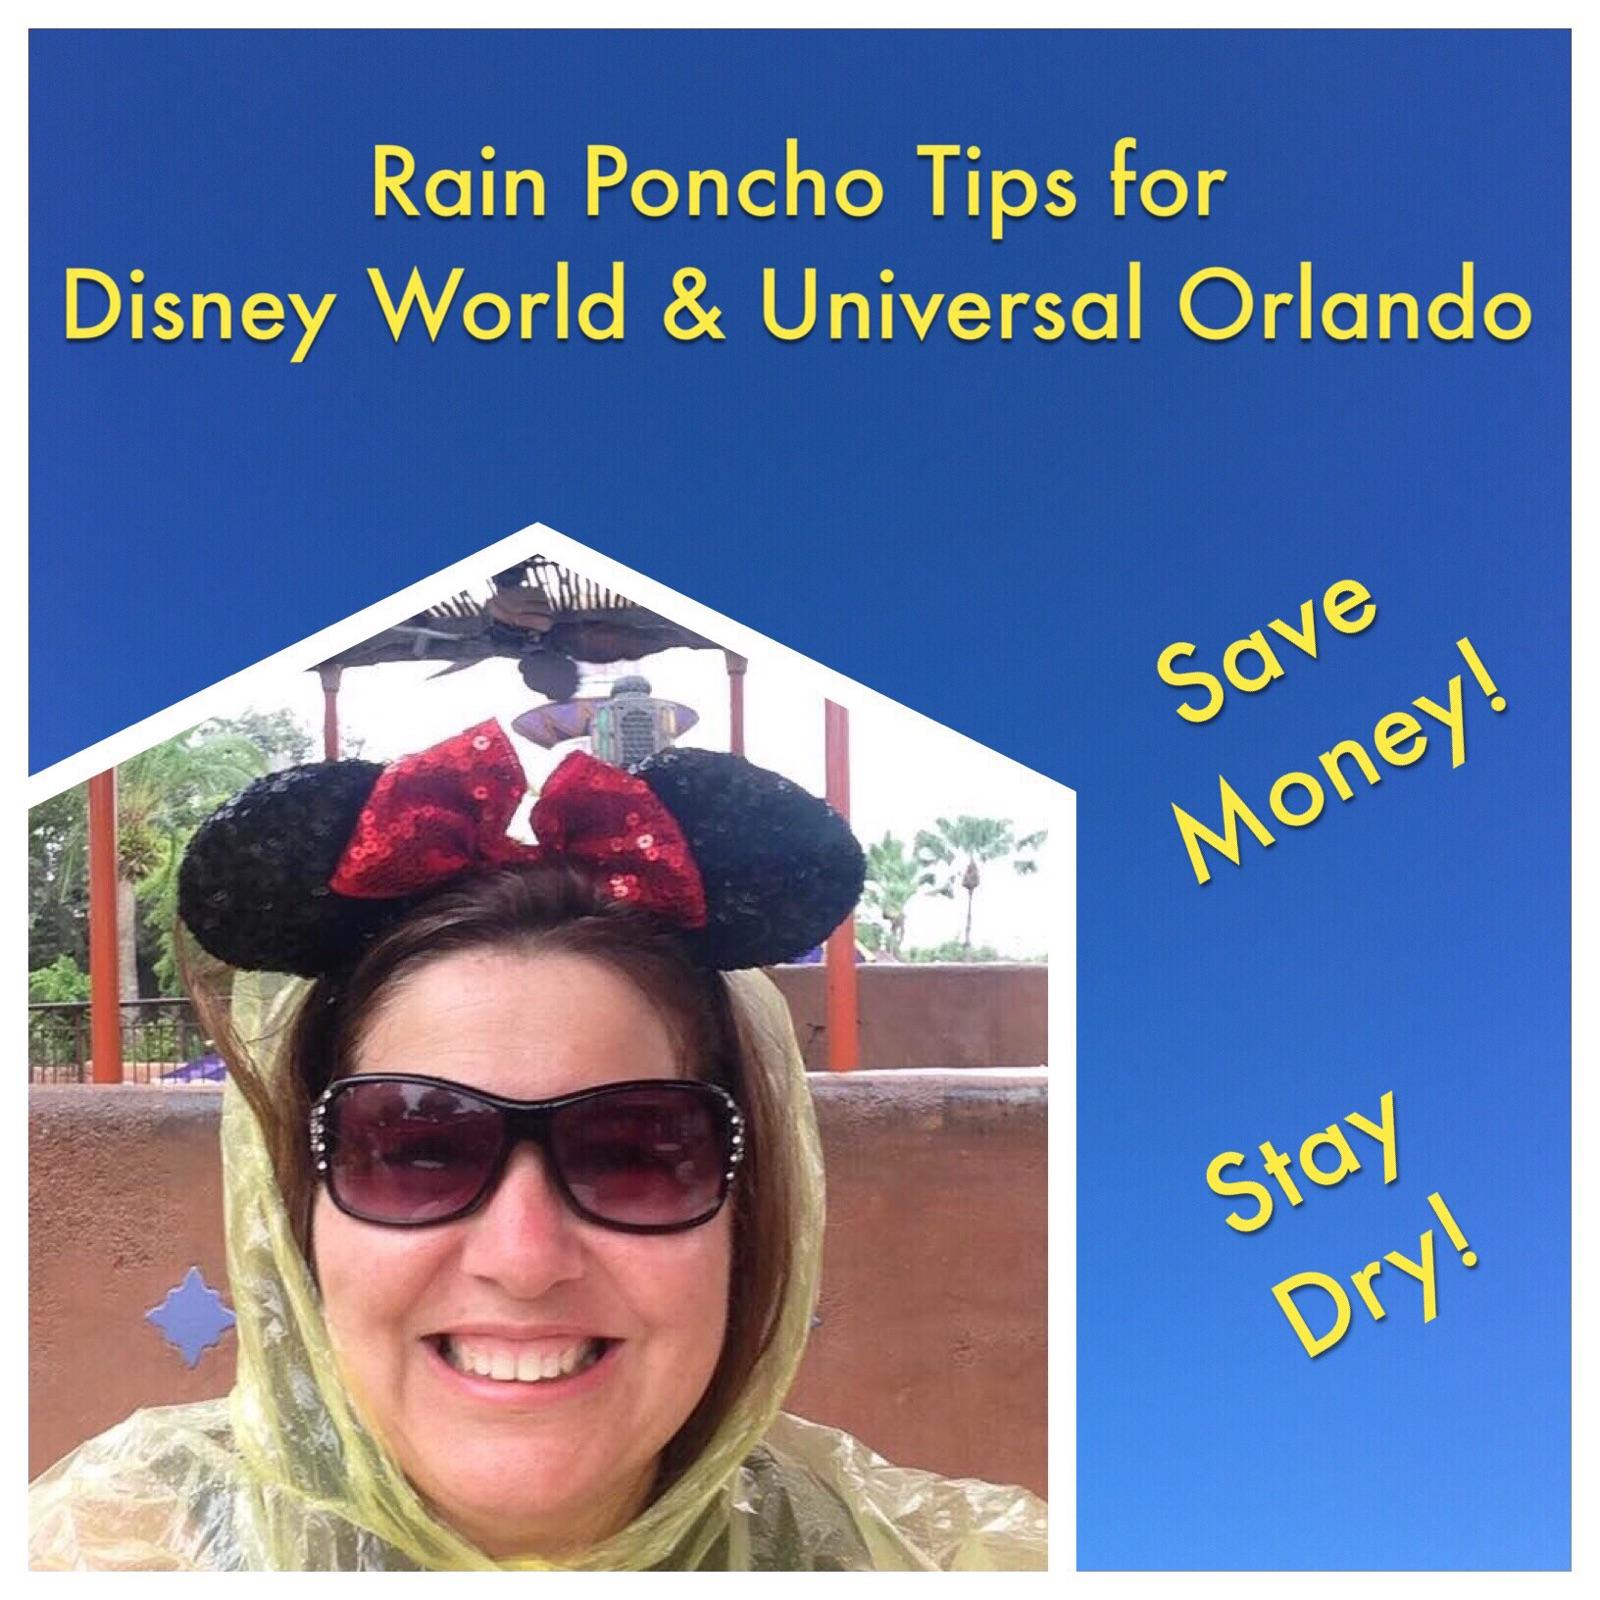 Rain Poncho Tips for Disney World & Universal Orlando- Save Money & Stay Dry.